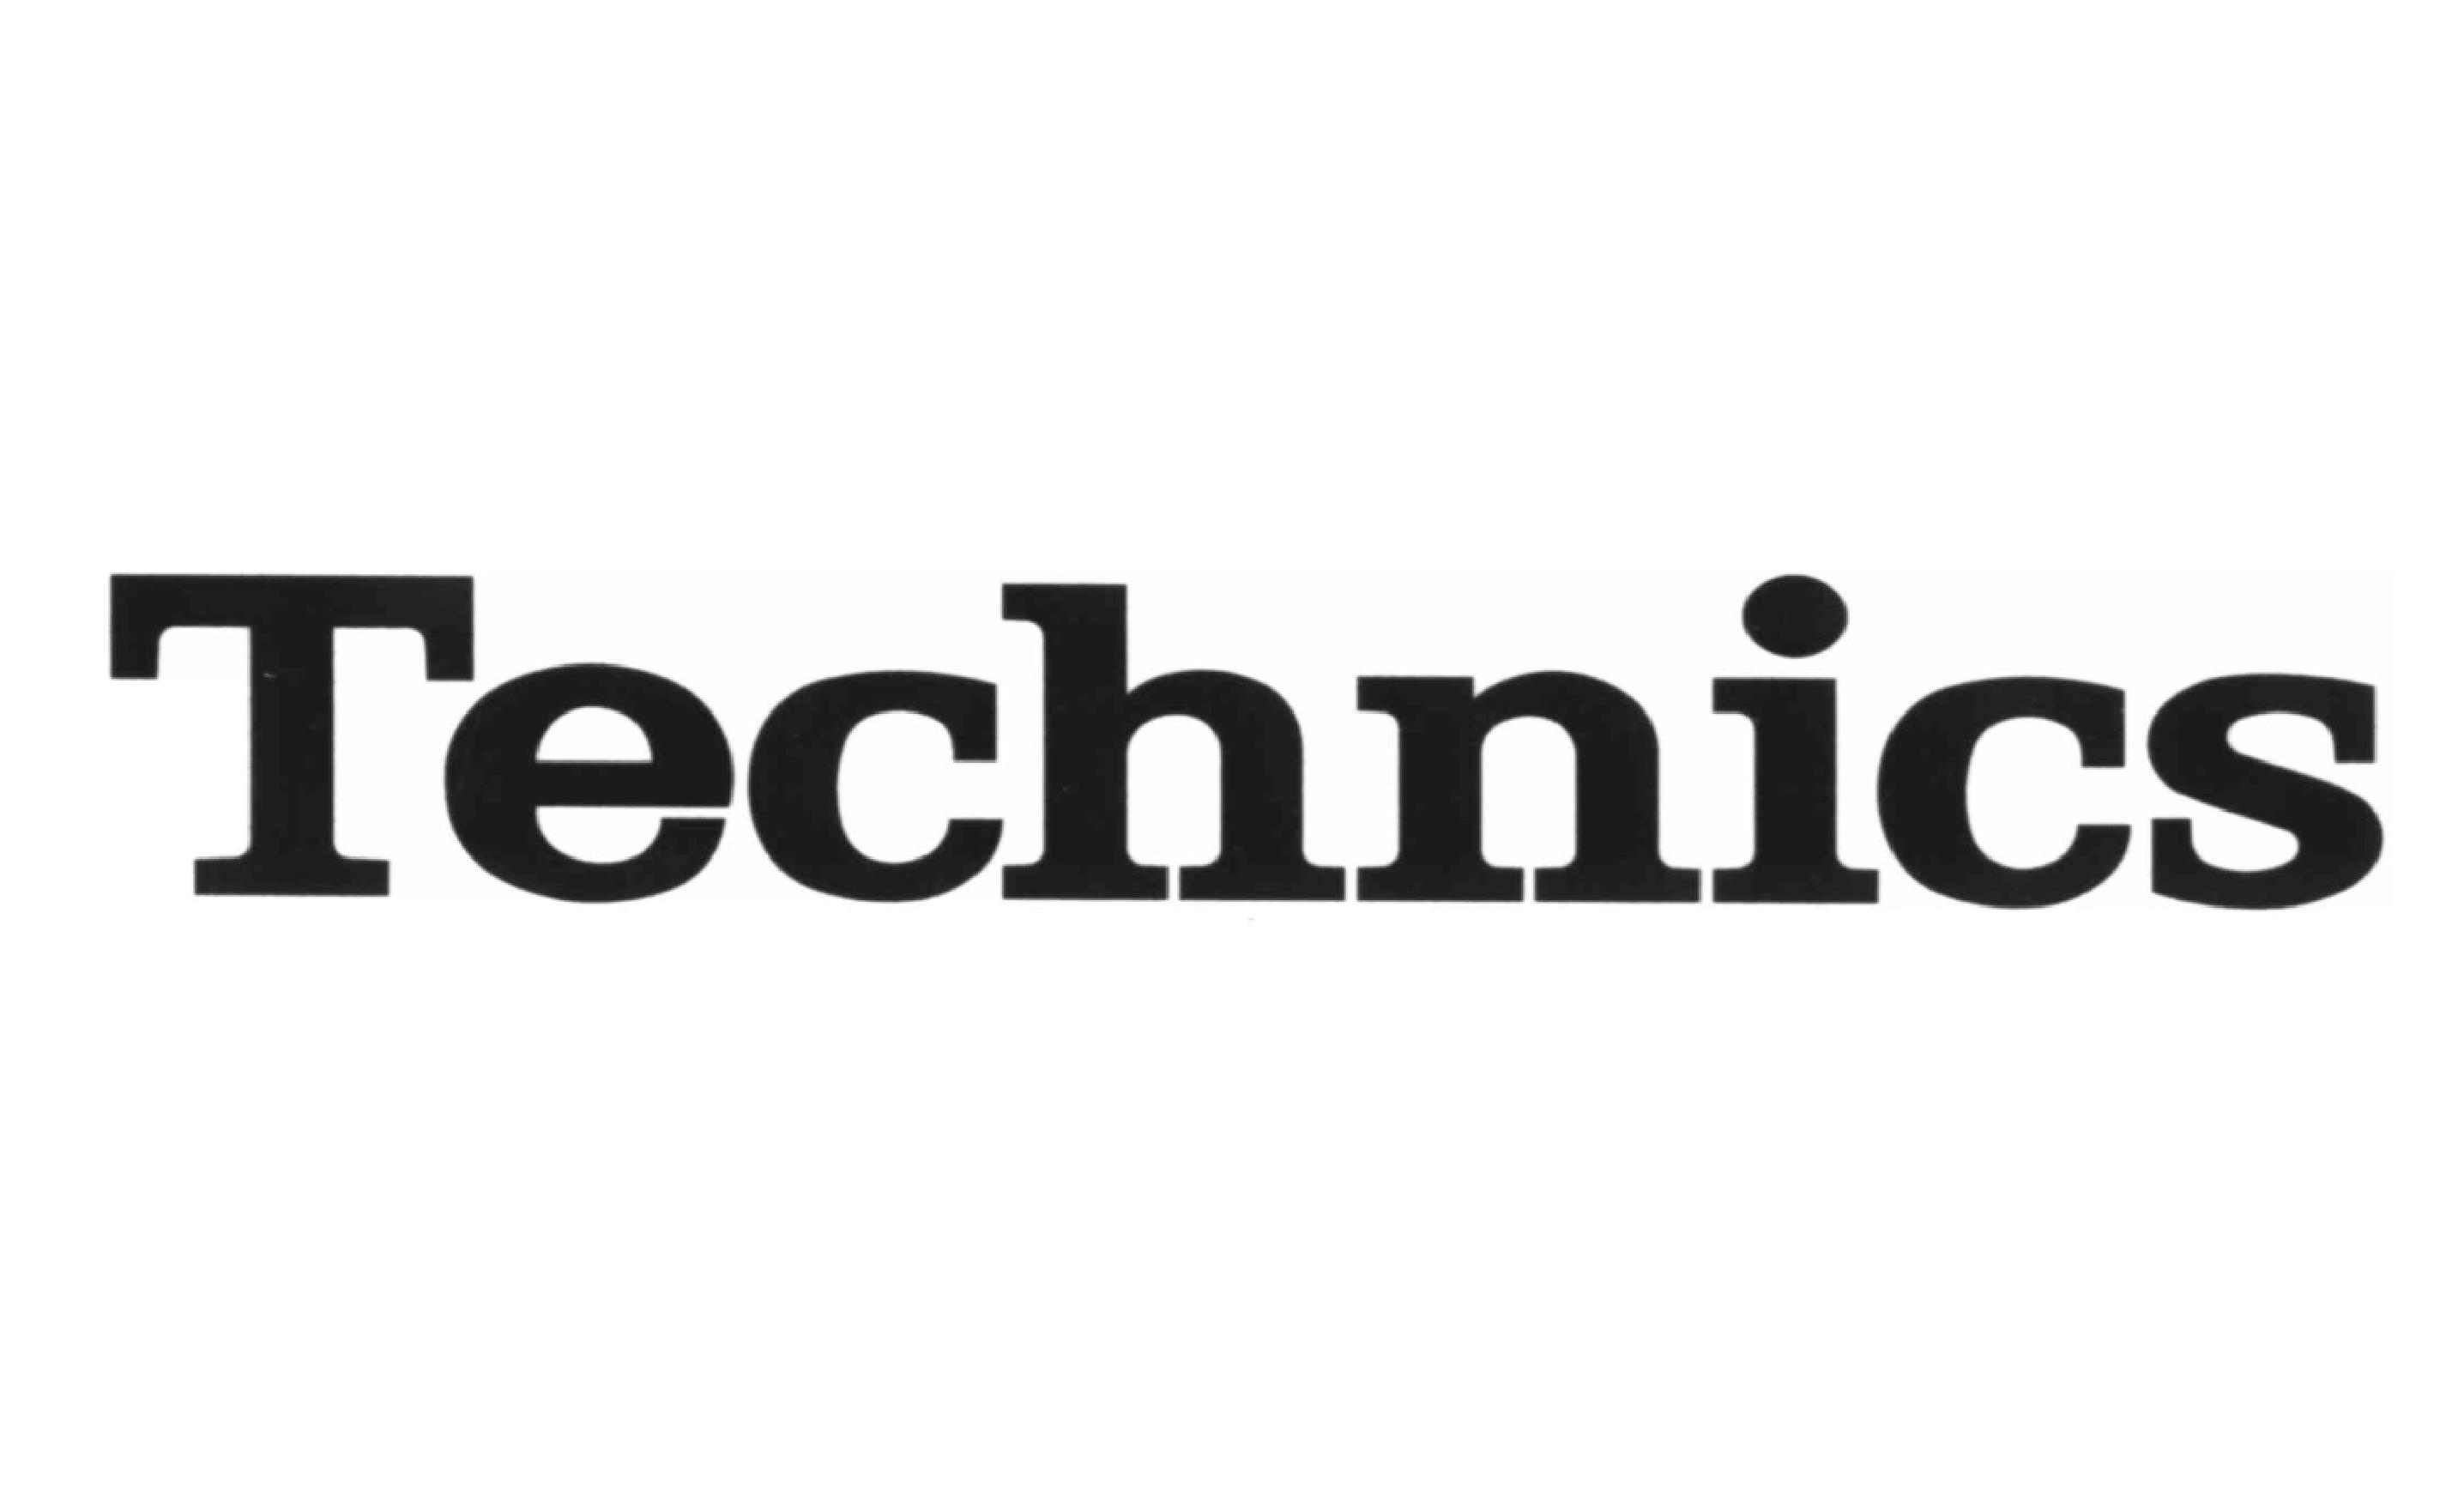 TECHNICS-01